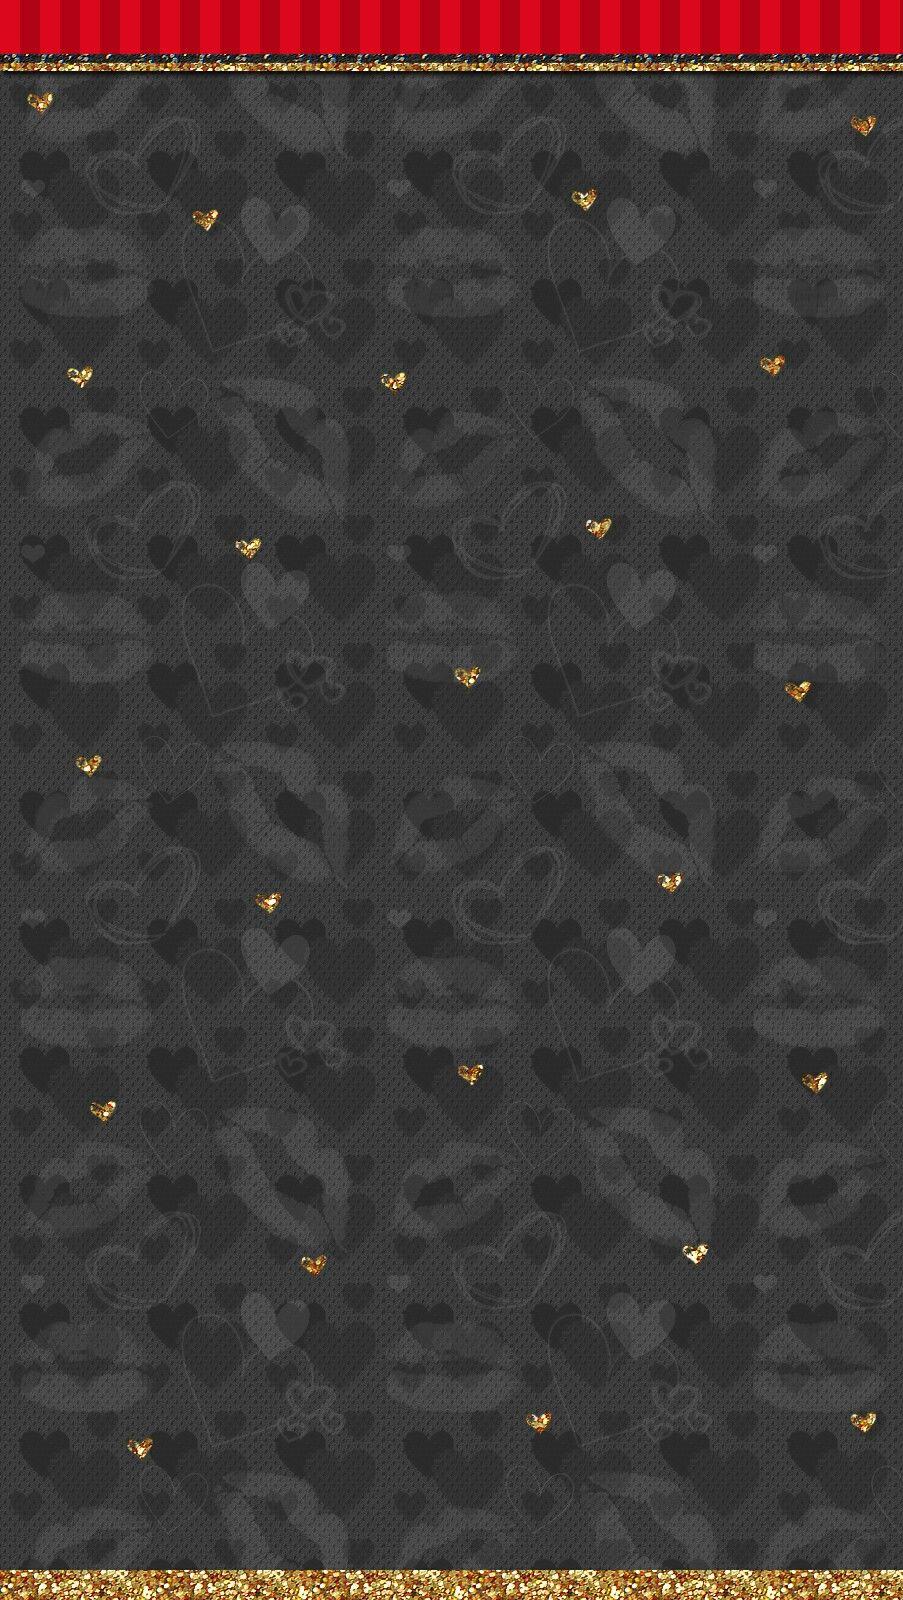 Black Wallpaper Iphone Glitter Valentines Day